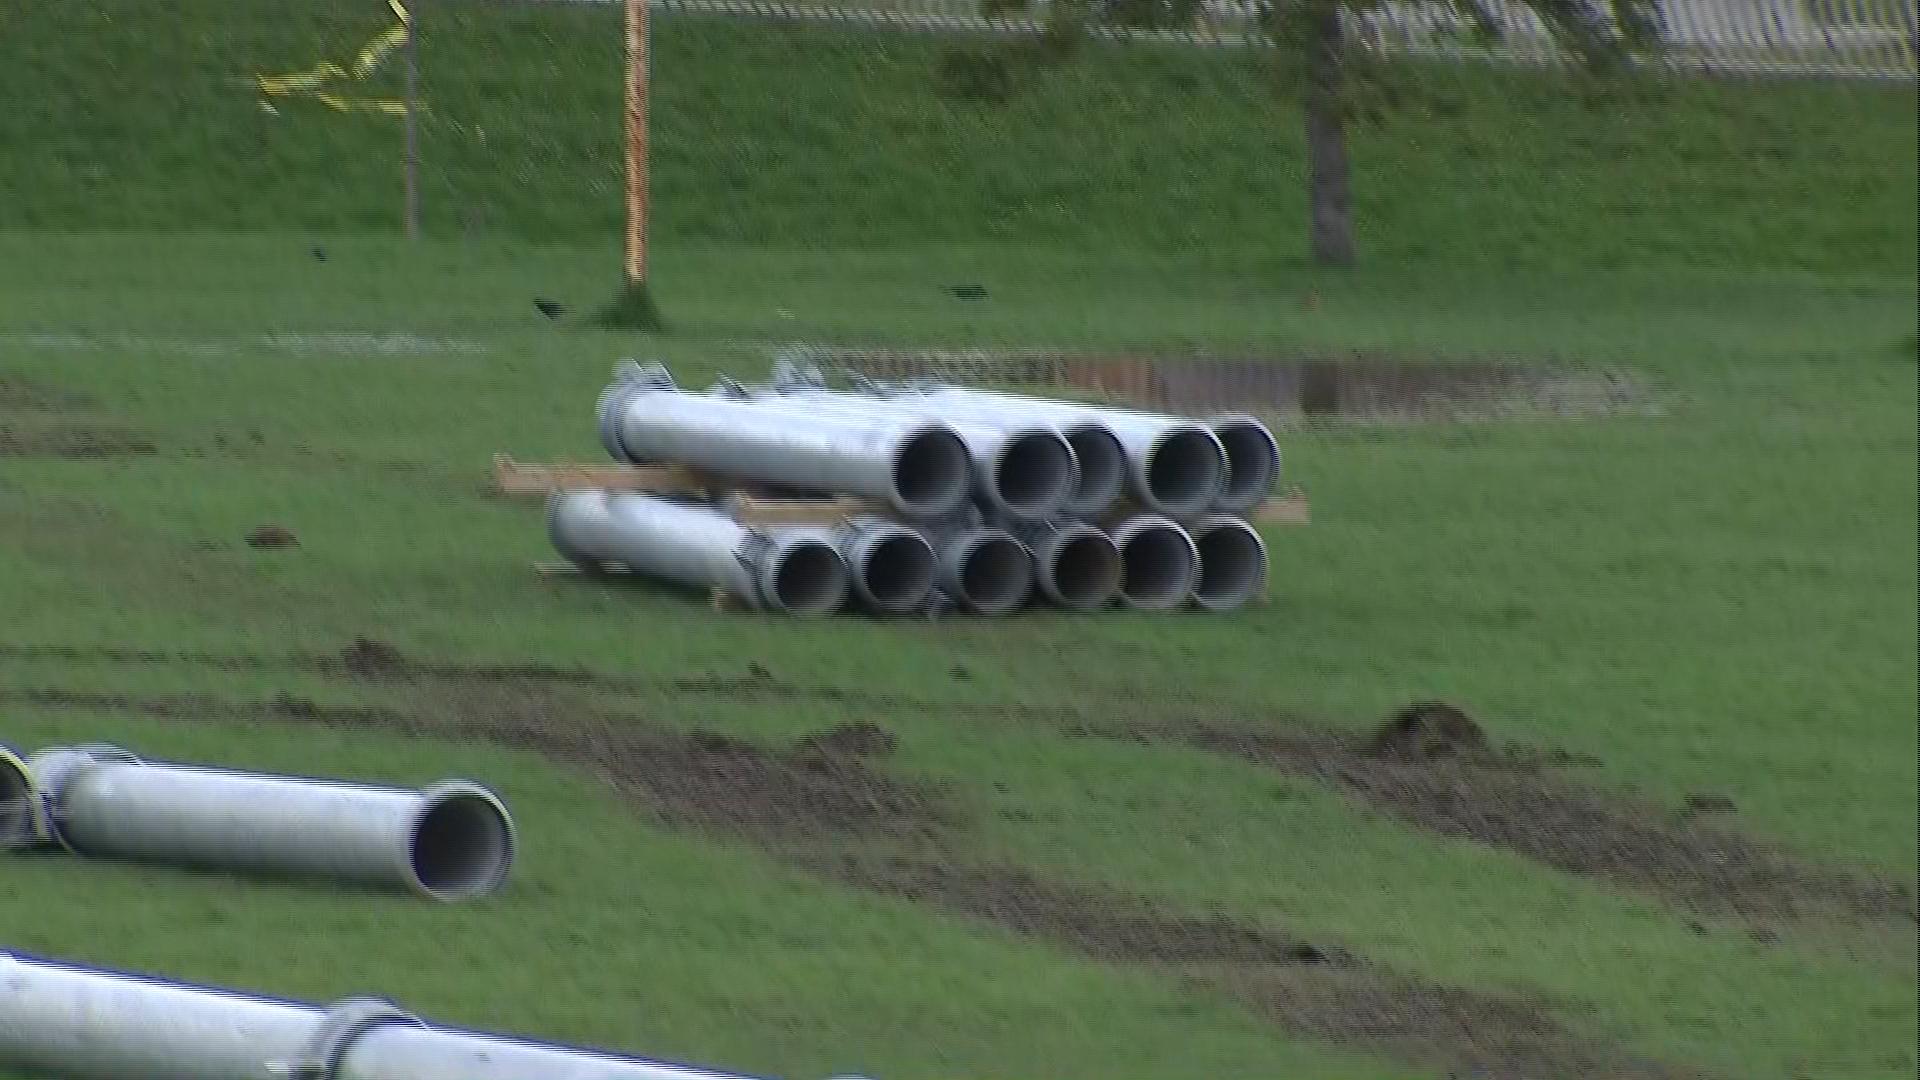 Yard closed school open after sewage leak in ajax citynews for Yard flooding problems